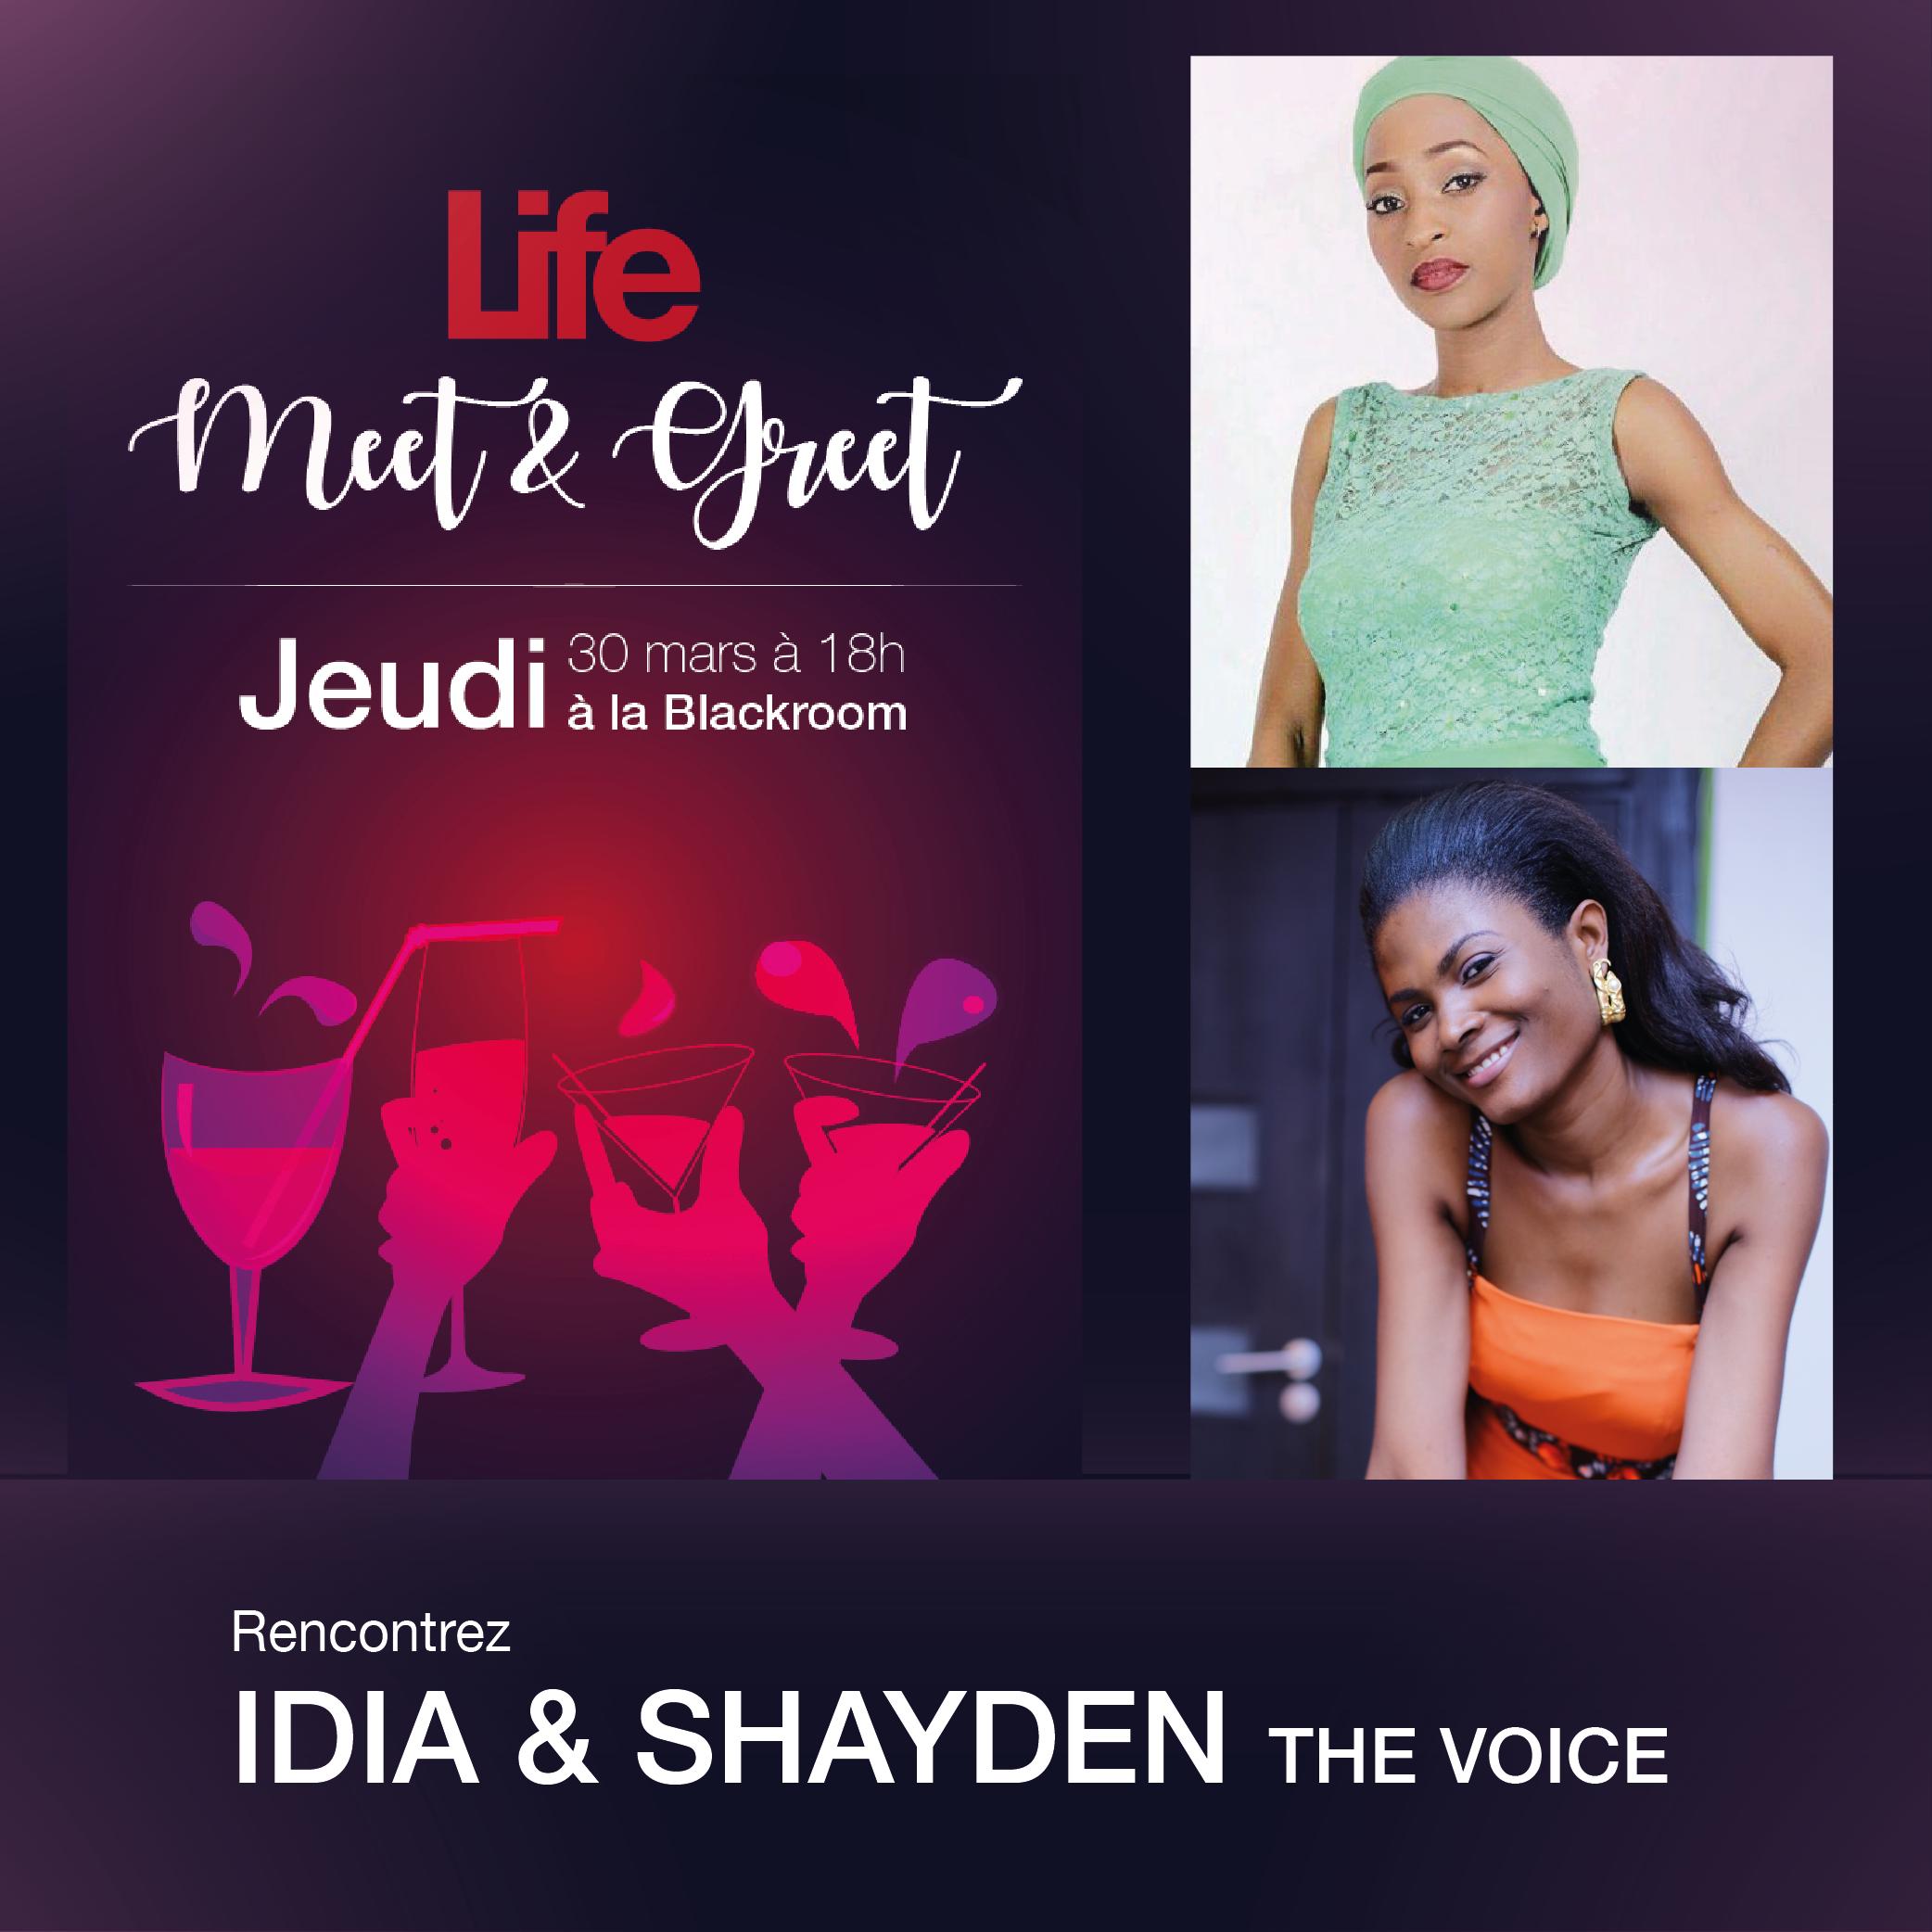 MEET and GREET LIFE IDIA SHADEN-01